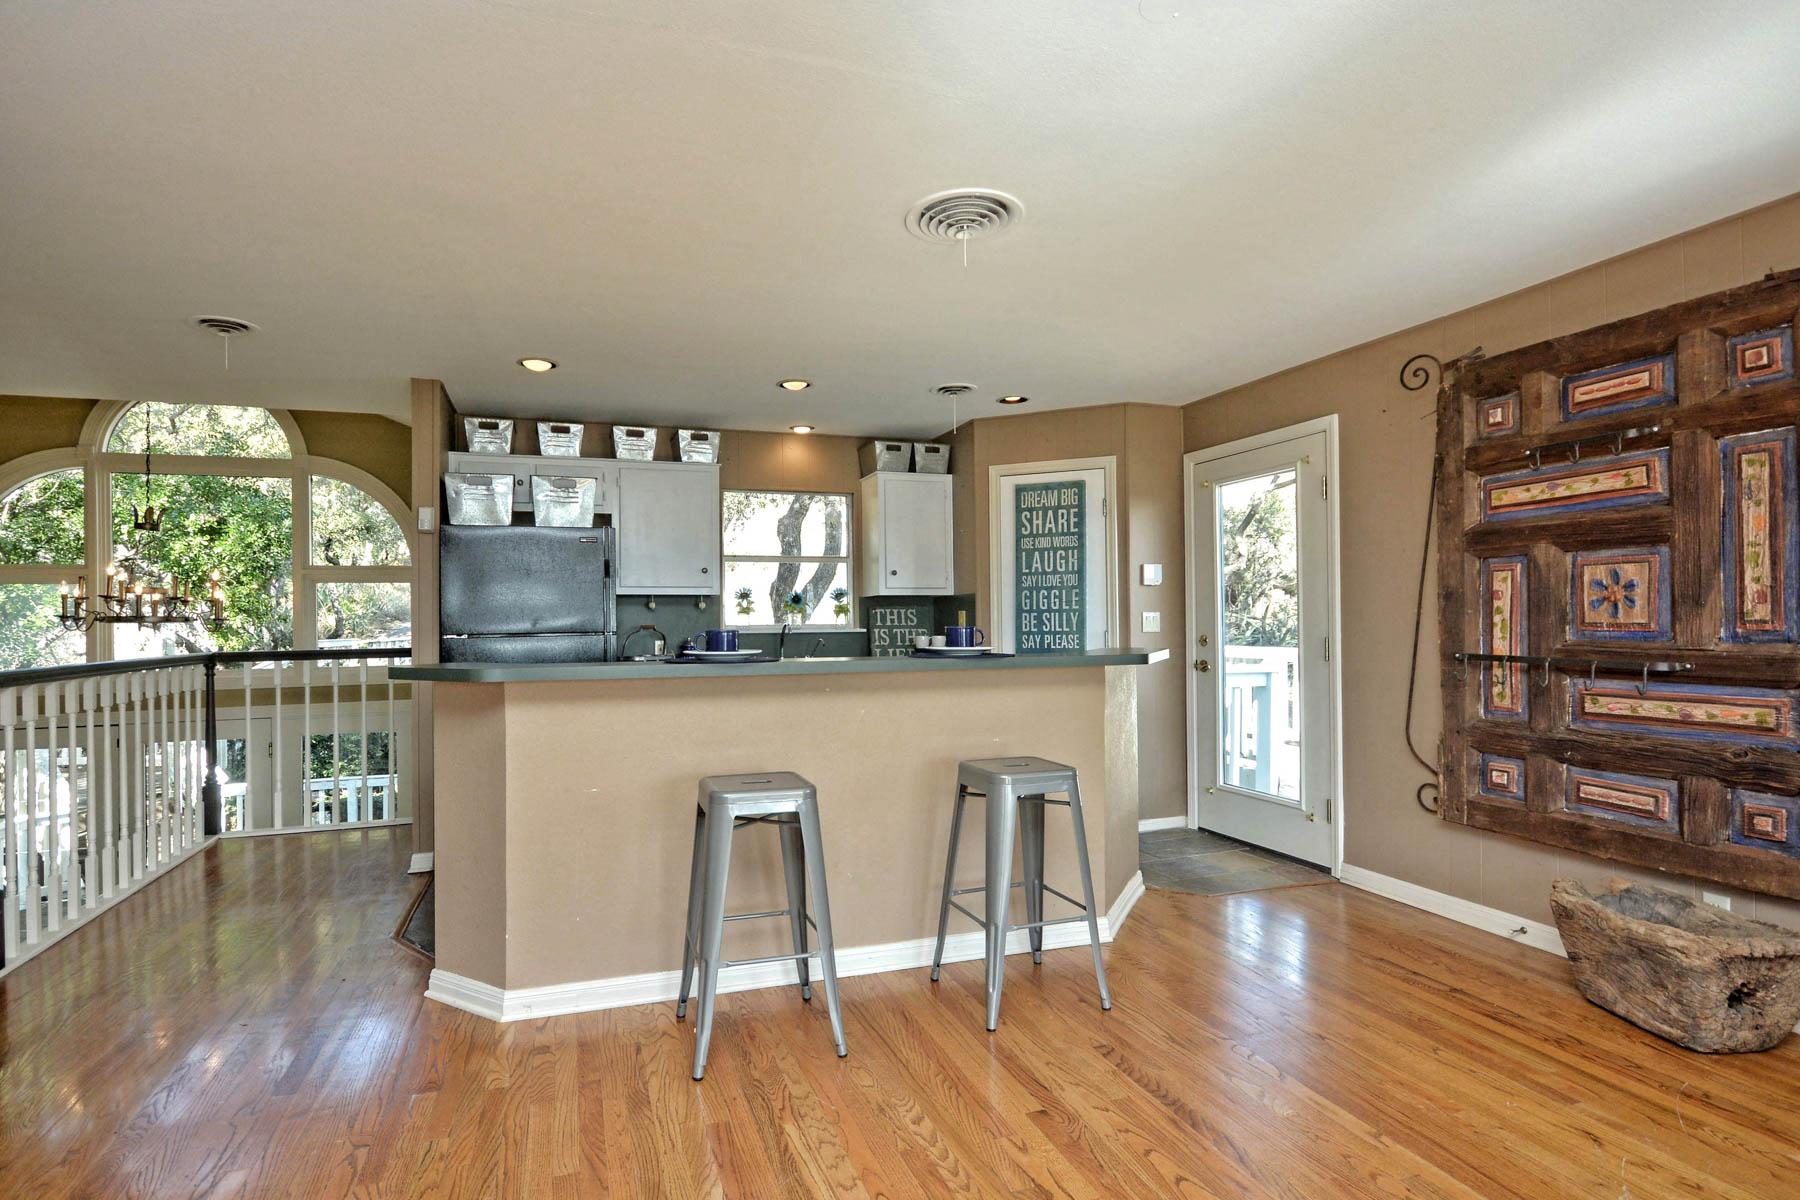 Additional photo for property listing at Hilltop Home Overlooking Lake LBJ 154 Skyline Dr Sunrise Beach, Texas 78643 Estados Unidos